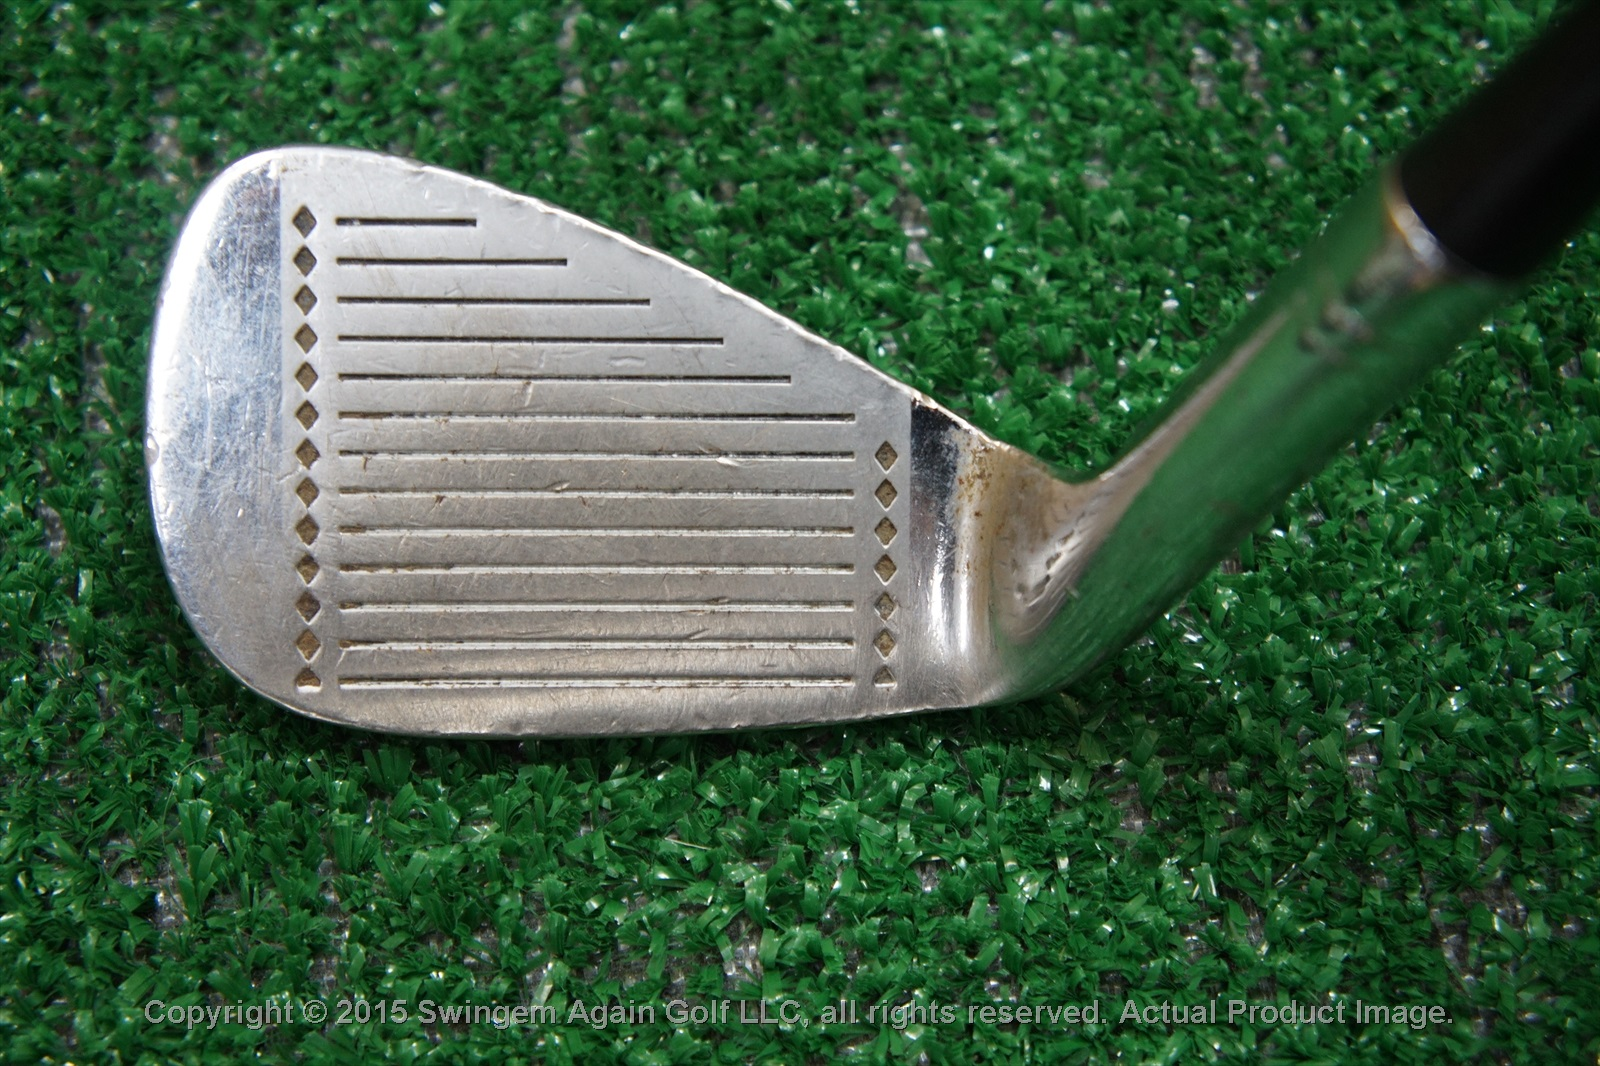 Titleist Tour Model 49 Degree Pitching Wedge Regular Flex